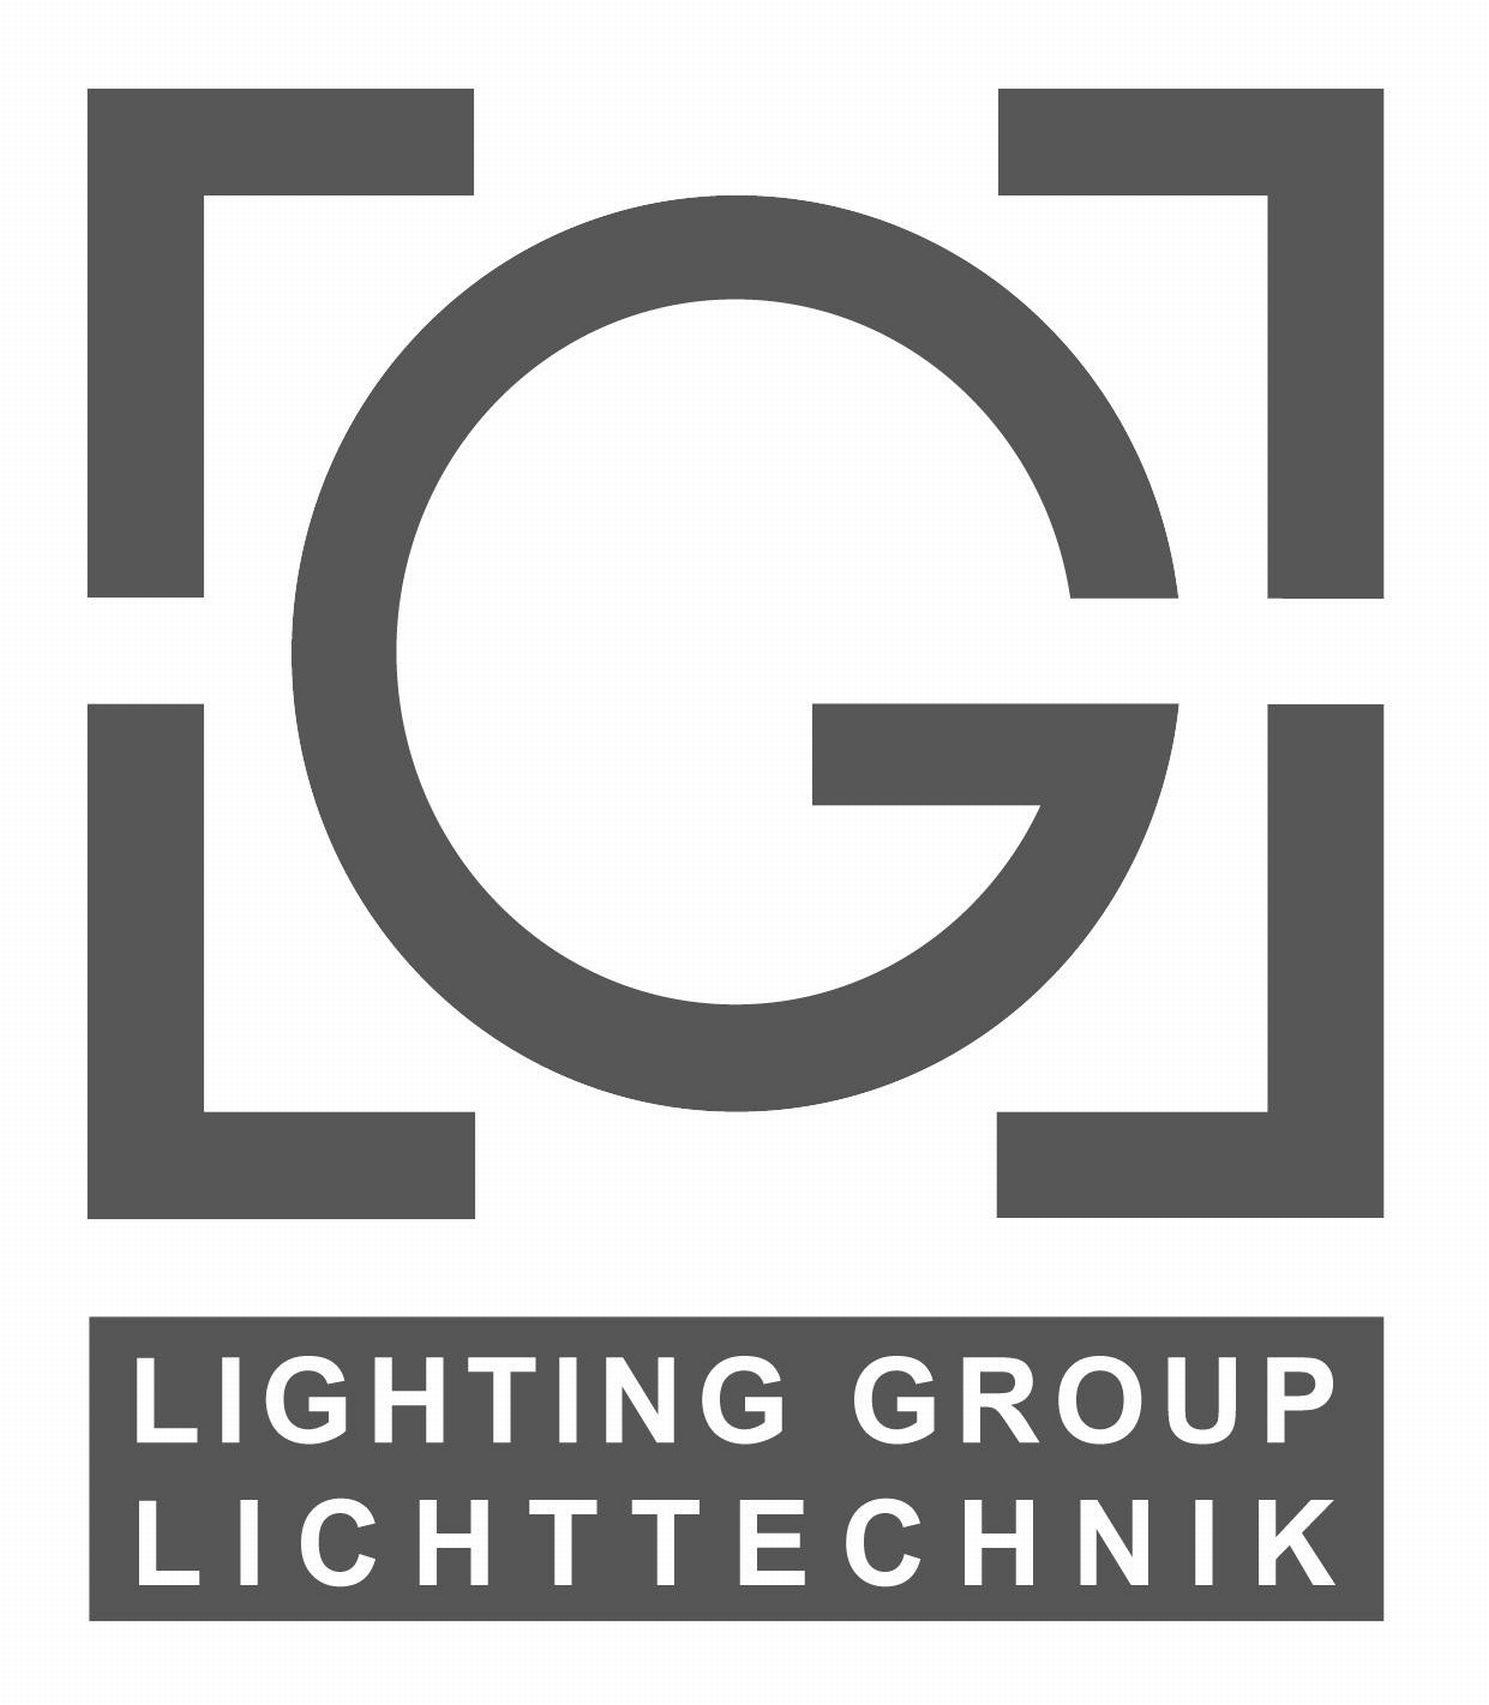 LGL Lichttechnik GmbH